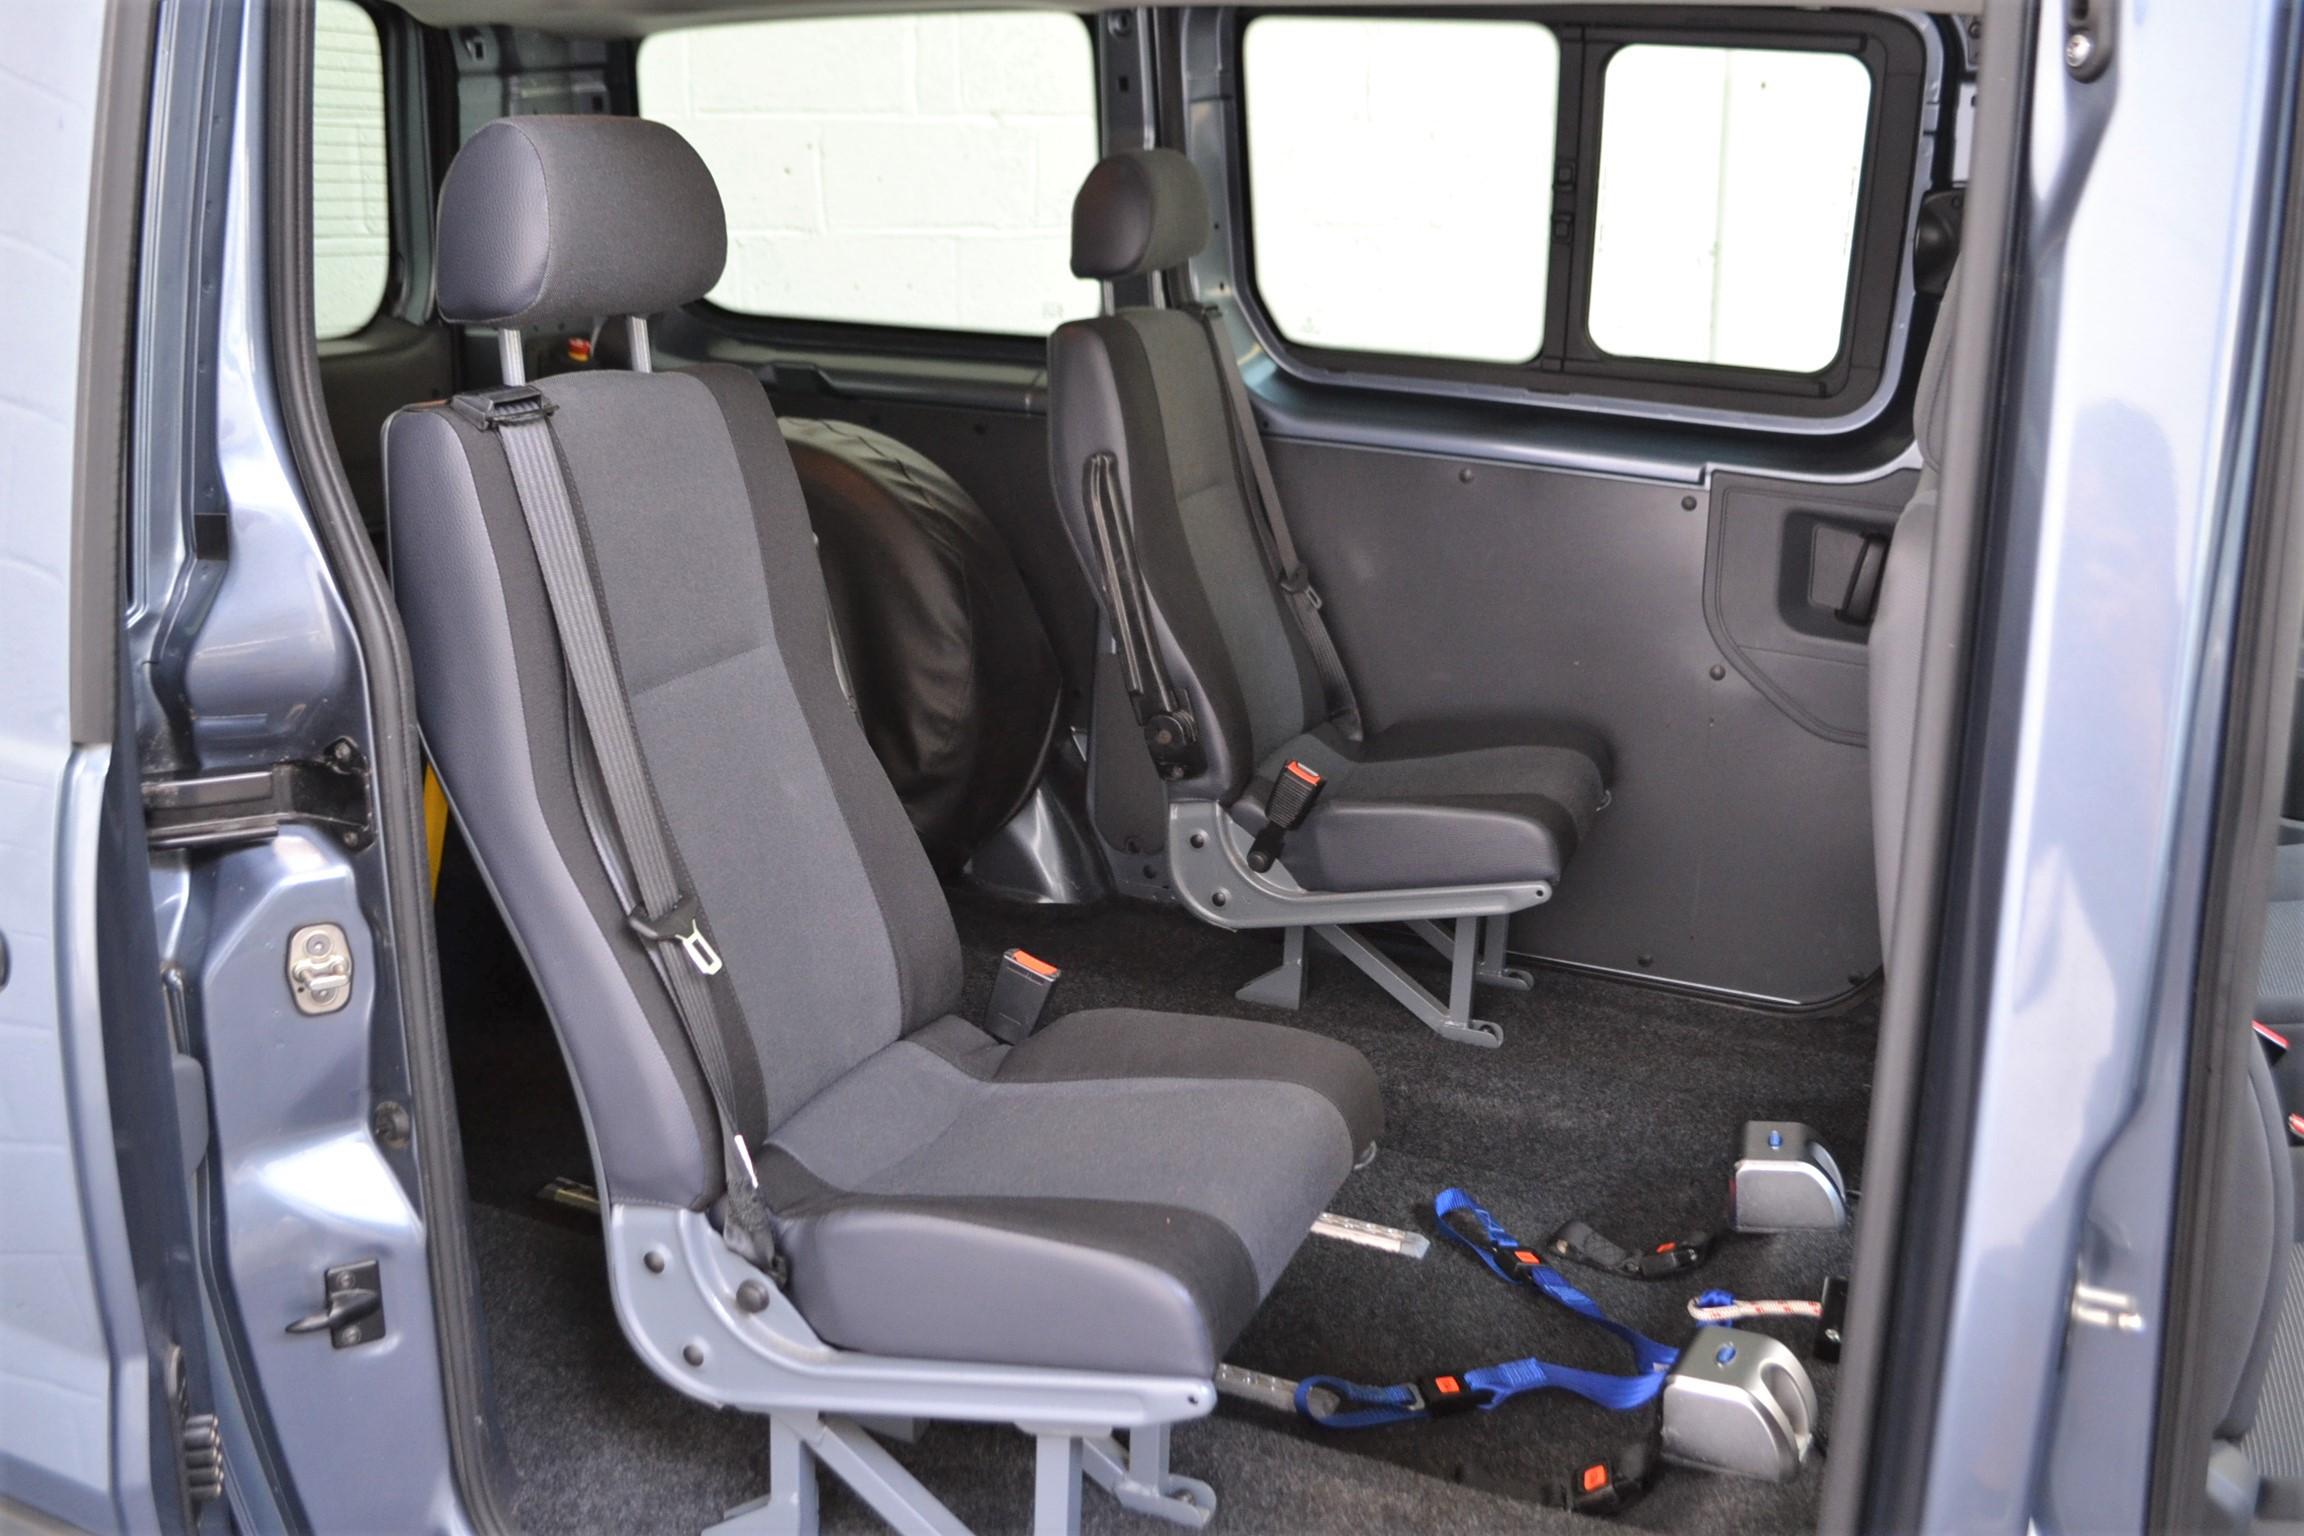 WAV Cars For Sale Bristol Wheelchair Accessible Vehicles Used For Sale Somerset Devon Dorset Bath Peugeot Expert YJ65 JDU 18